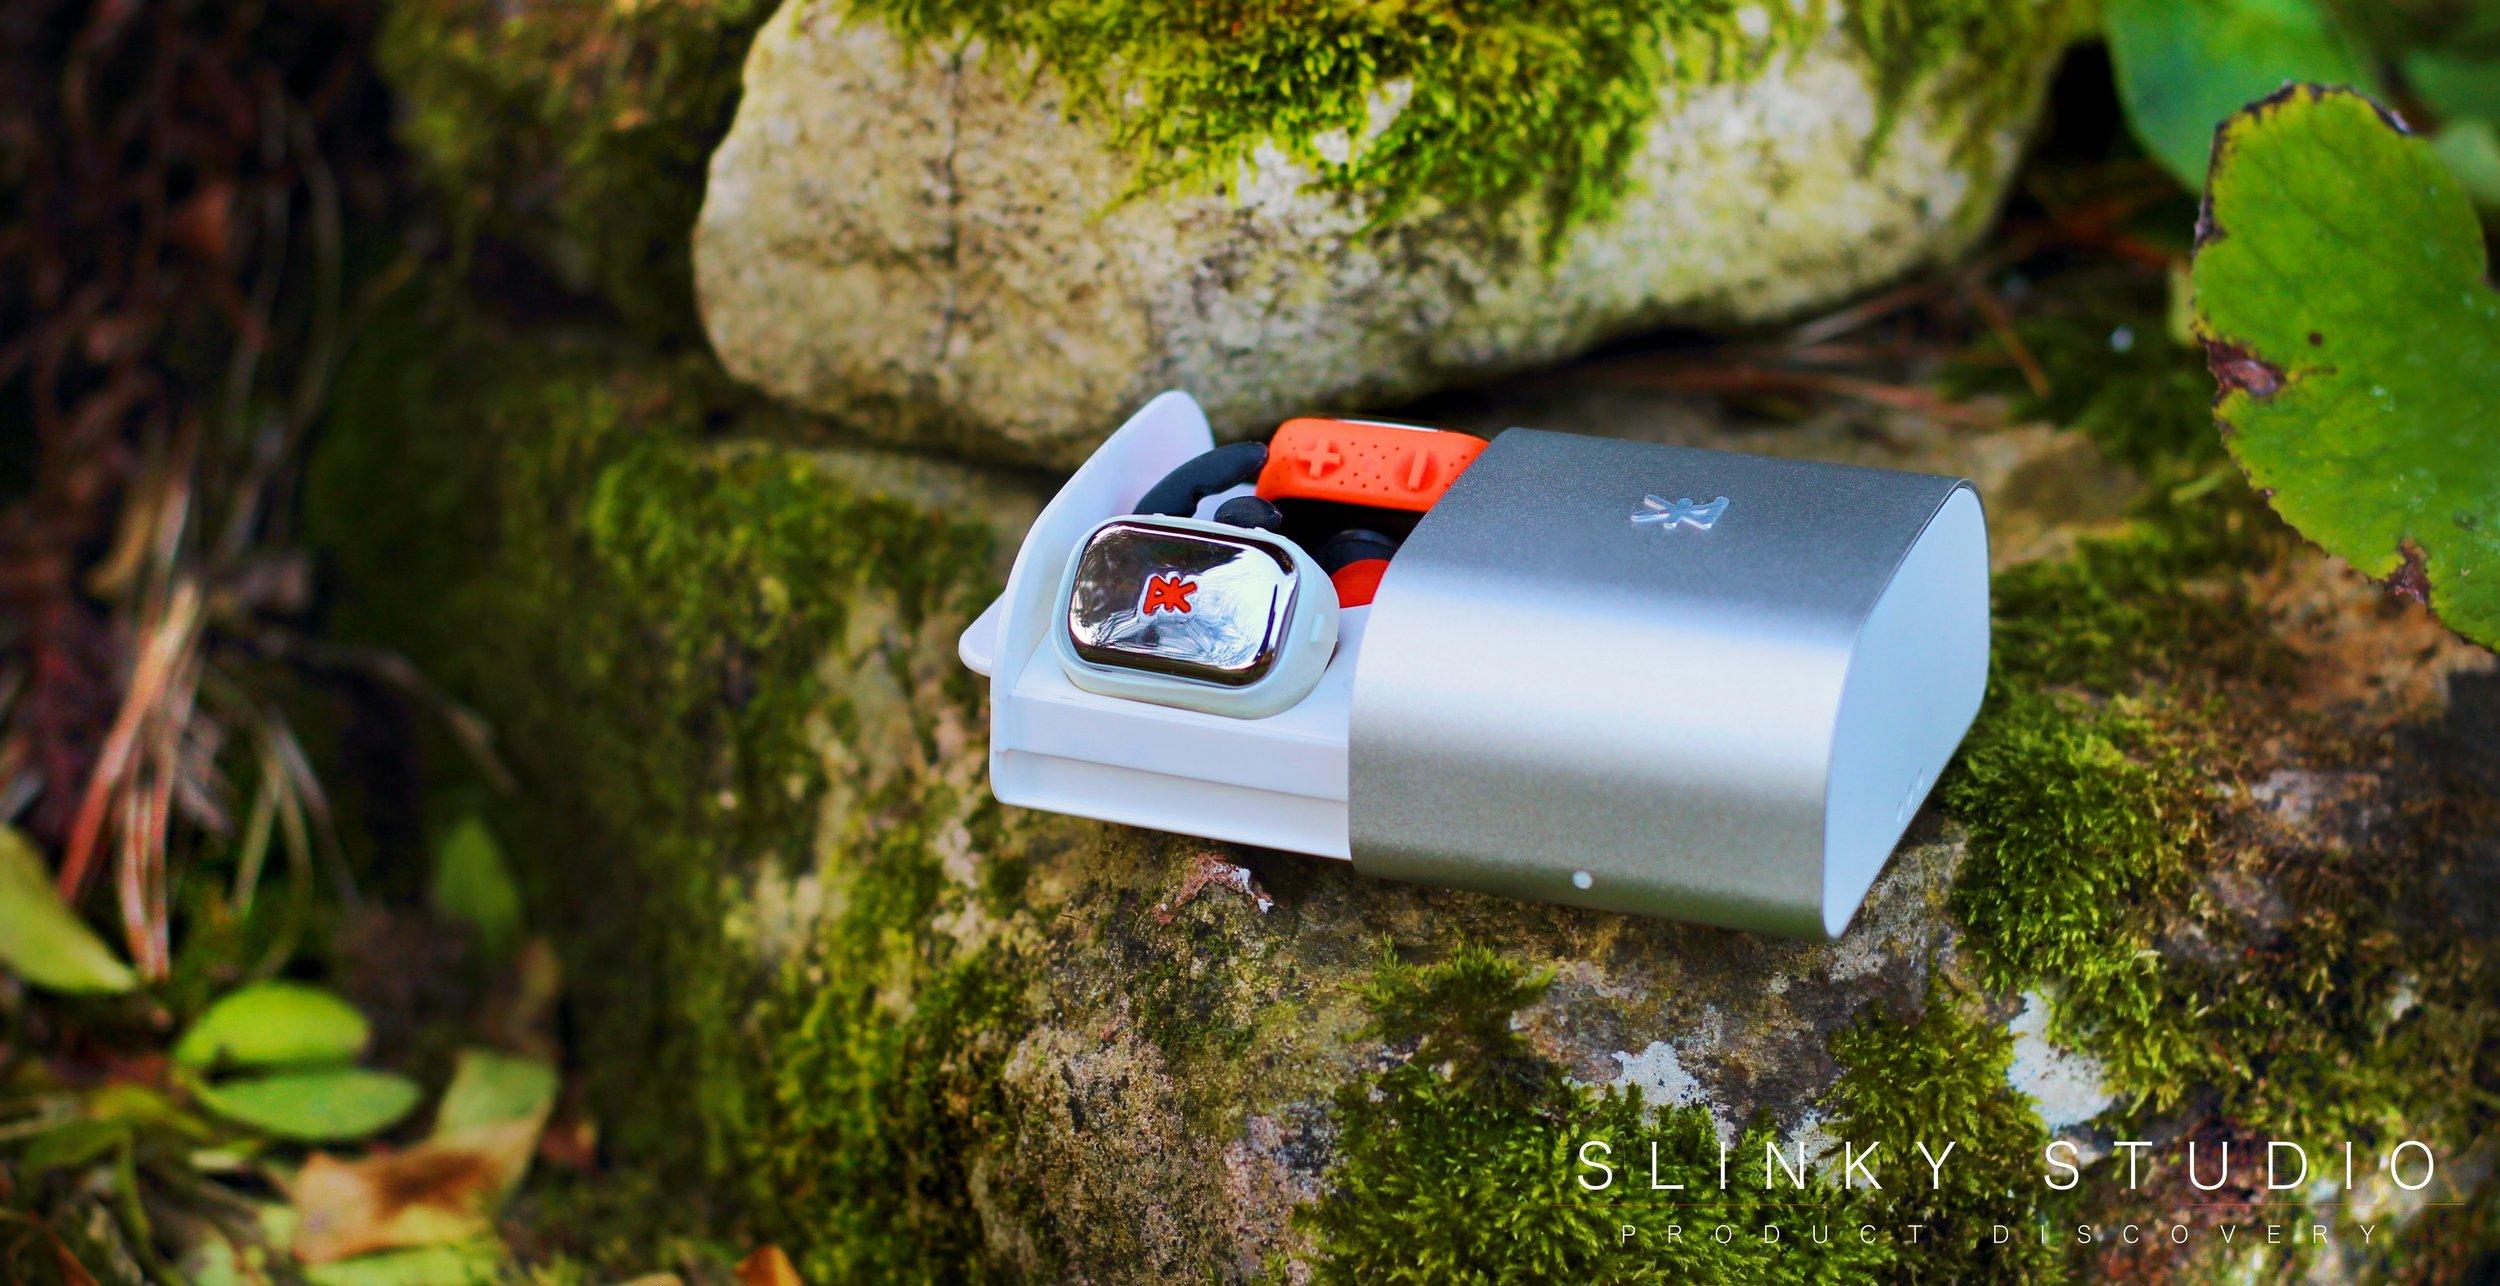 PKparis K'asq Earbuds Charging Box.jpg